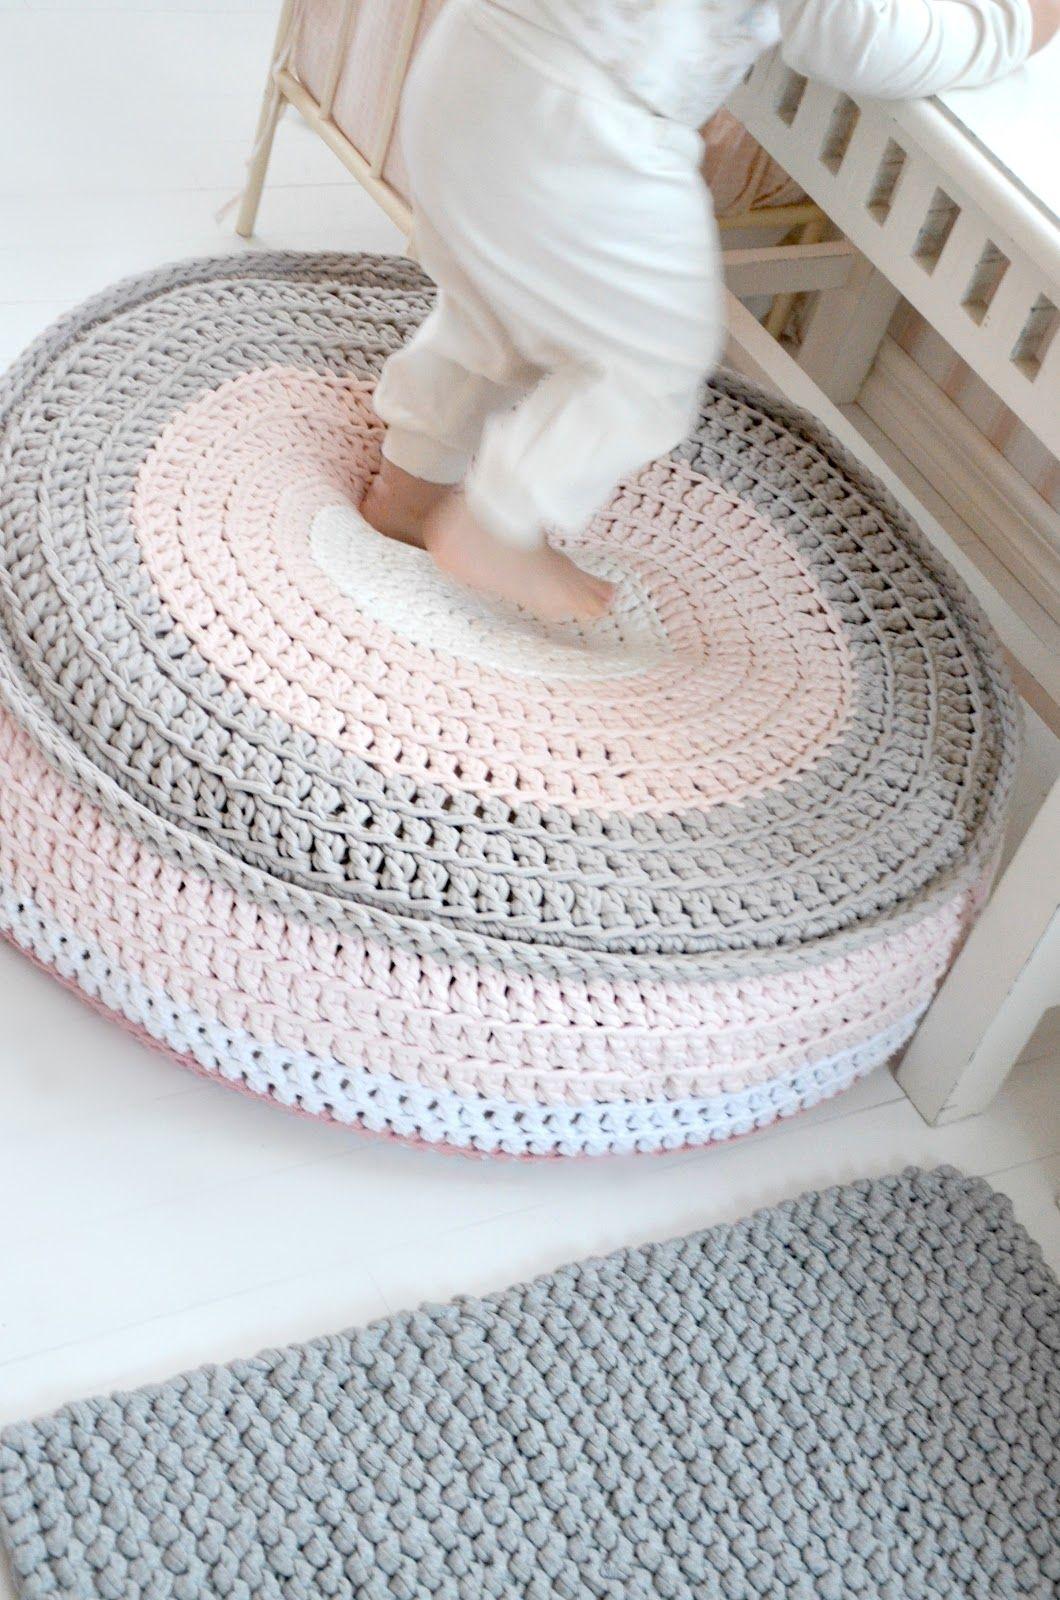 t-shirt crochet pouf and cushion by Kaunis pieni elämä | Kids decor ...